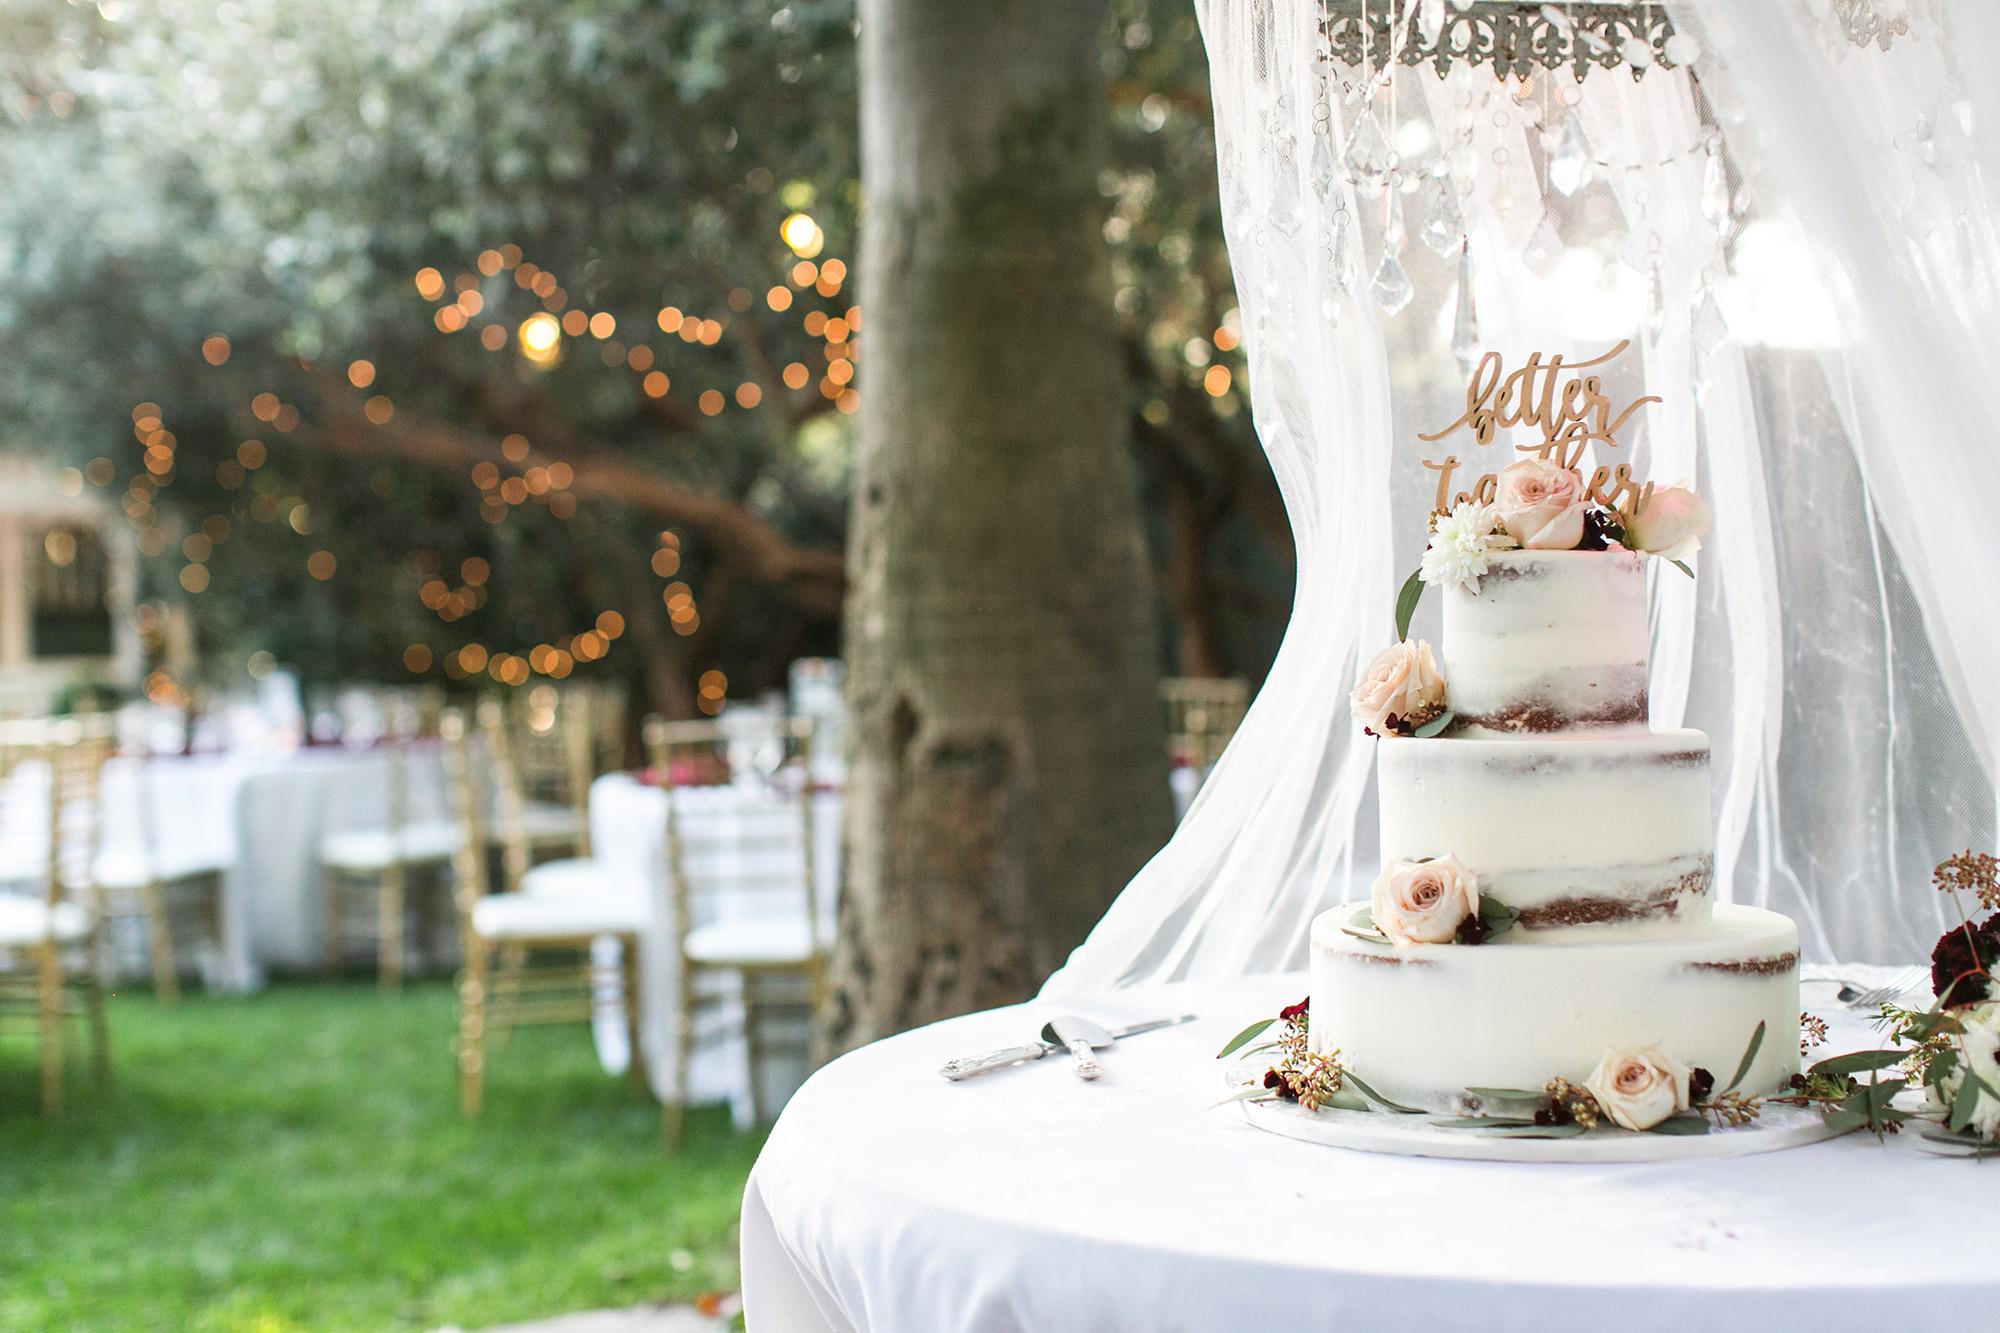 associate-photographer-christmas-house-wedding-carrie-vines-0008.jpg